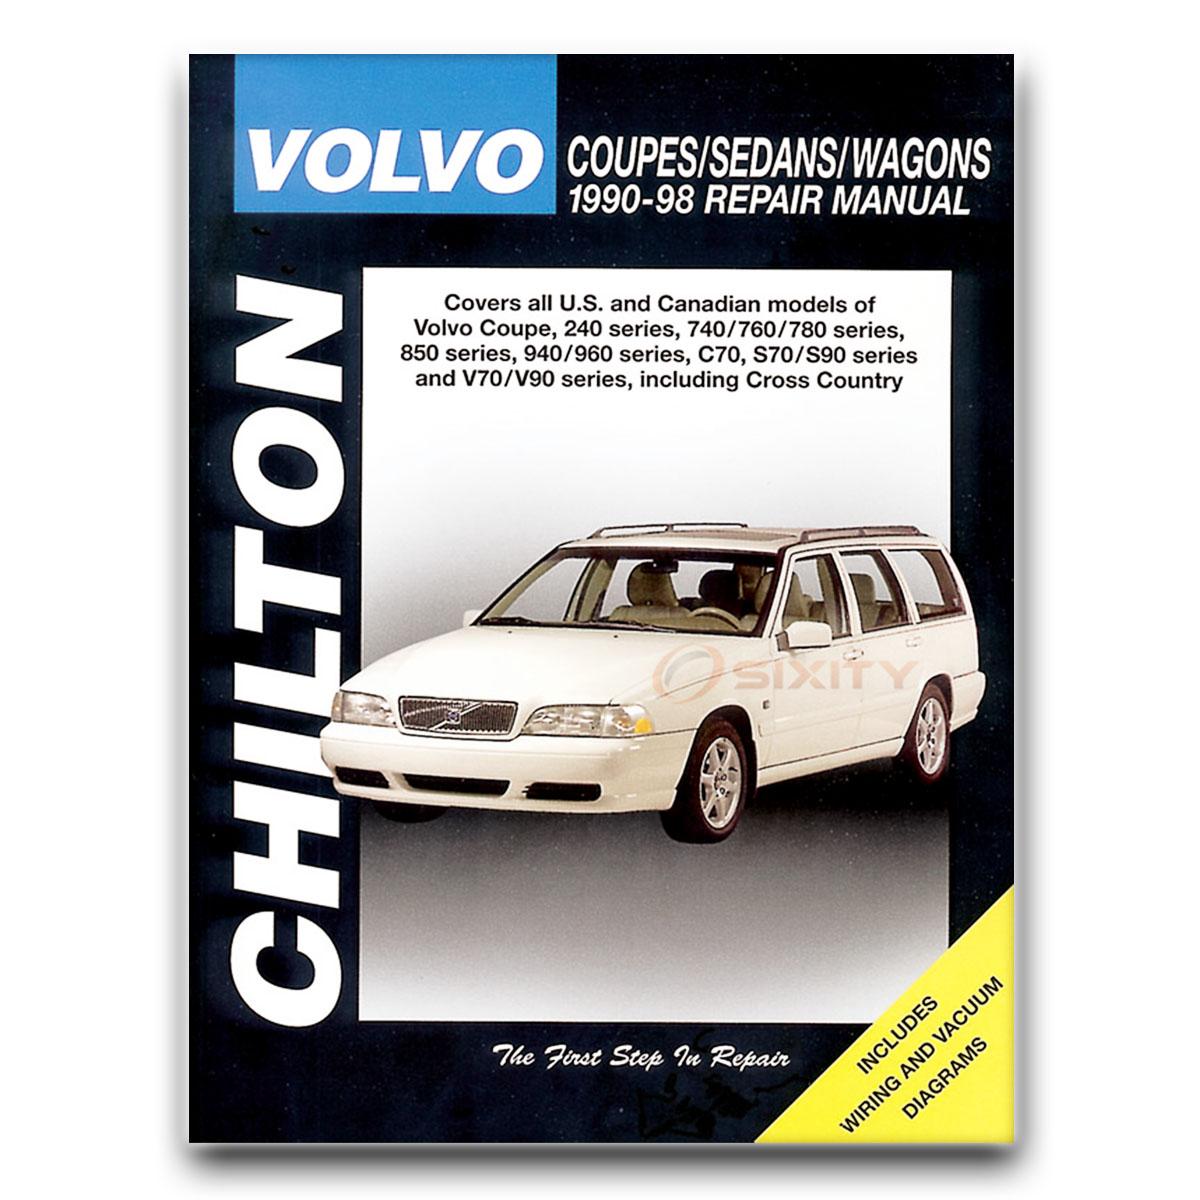 volvo 780 chilton repair manual base shop service garage book nx ebay rh ebay com Volvo Car Manuals Volvo Car Manuals